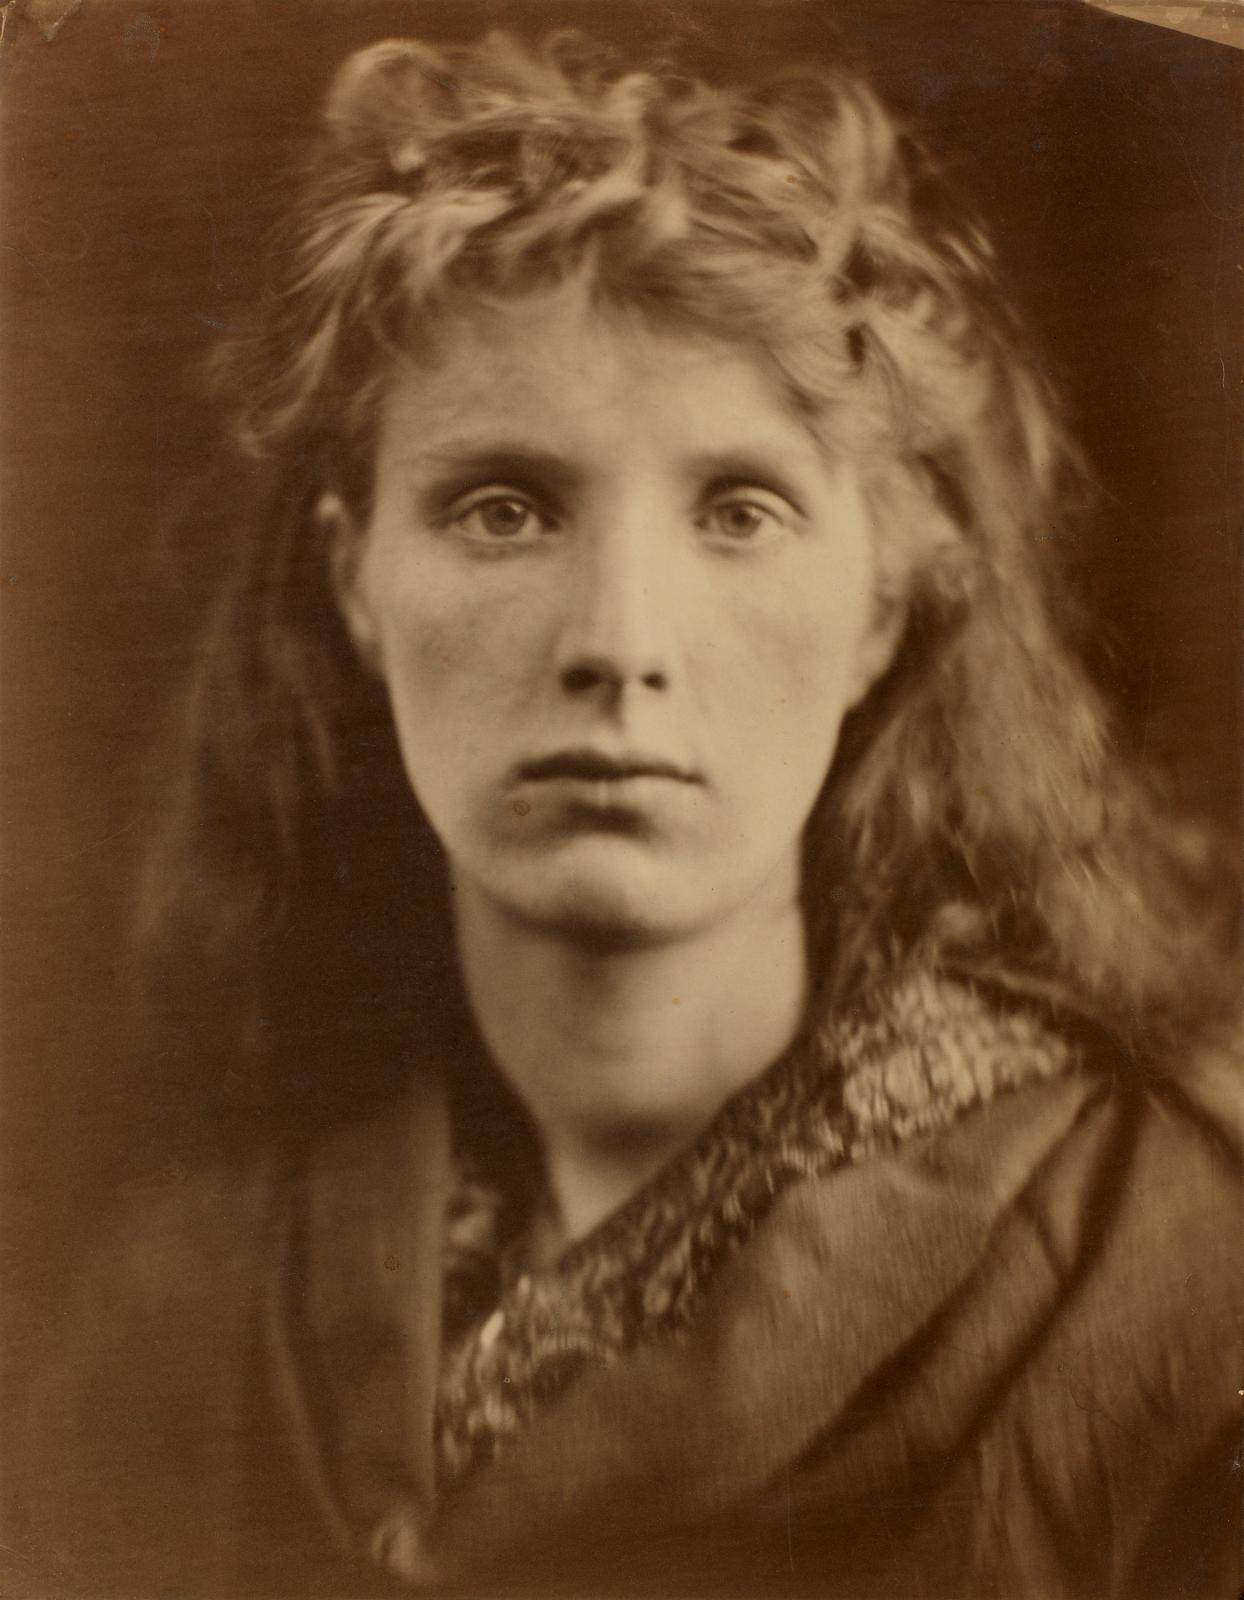 Julia Margaret Cameron (1815-1879), The Mountain Nymph, Sweet Liberty, 1866, photo on albumen paper, 36.5 x 28.5 cm.© Åsa Lundén/Moderna M